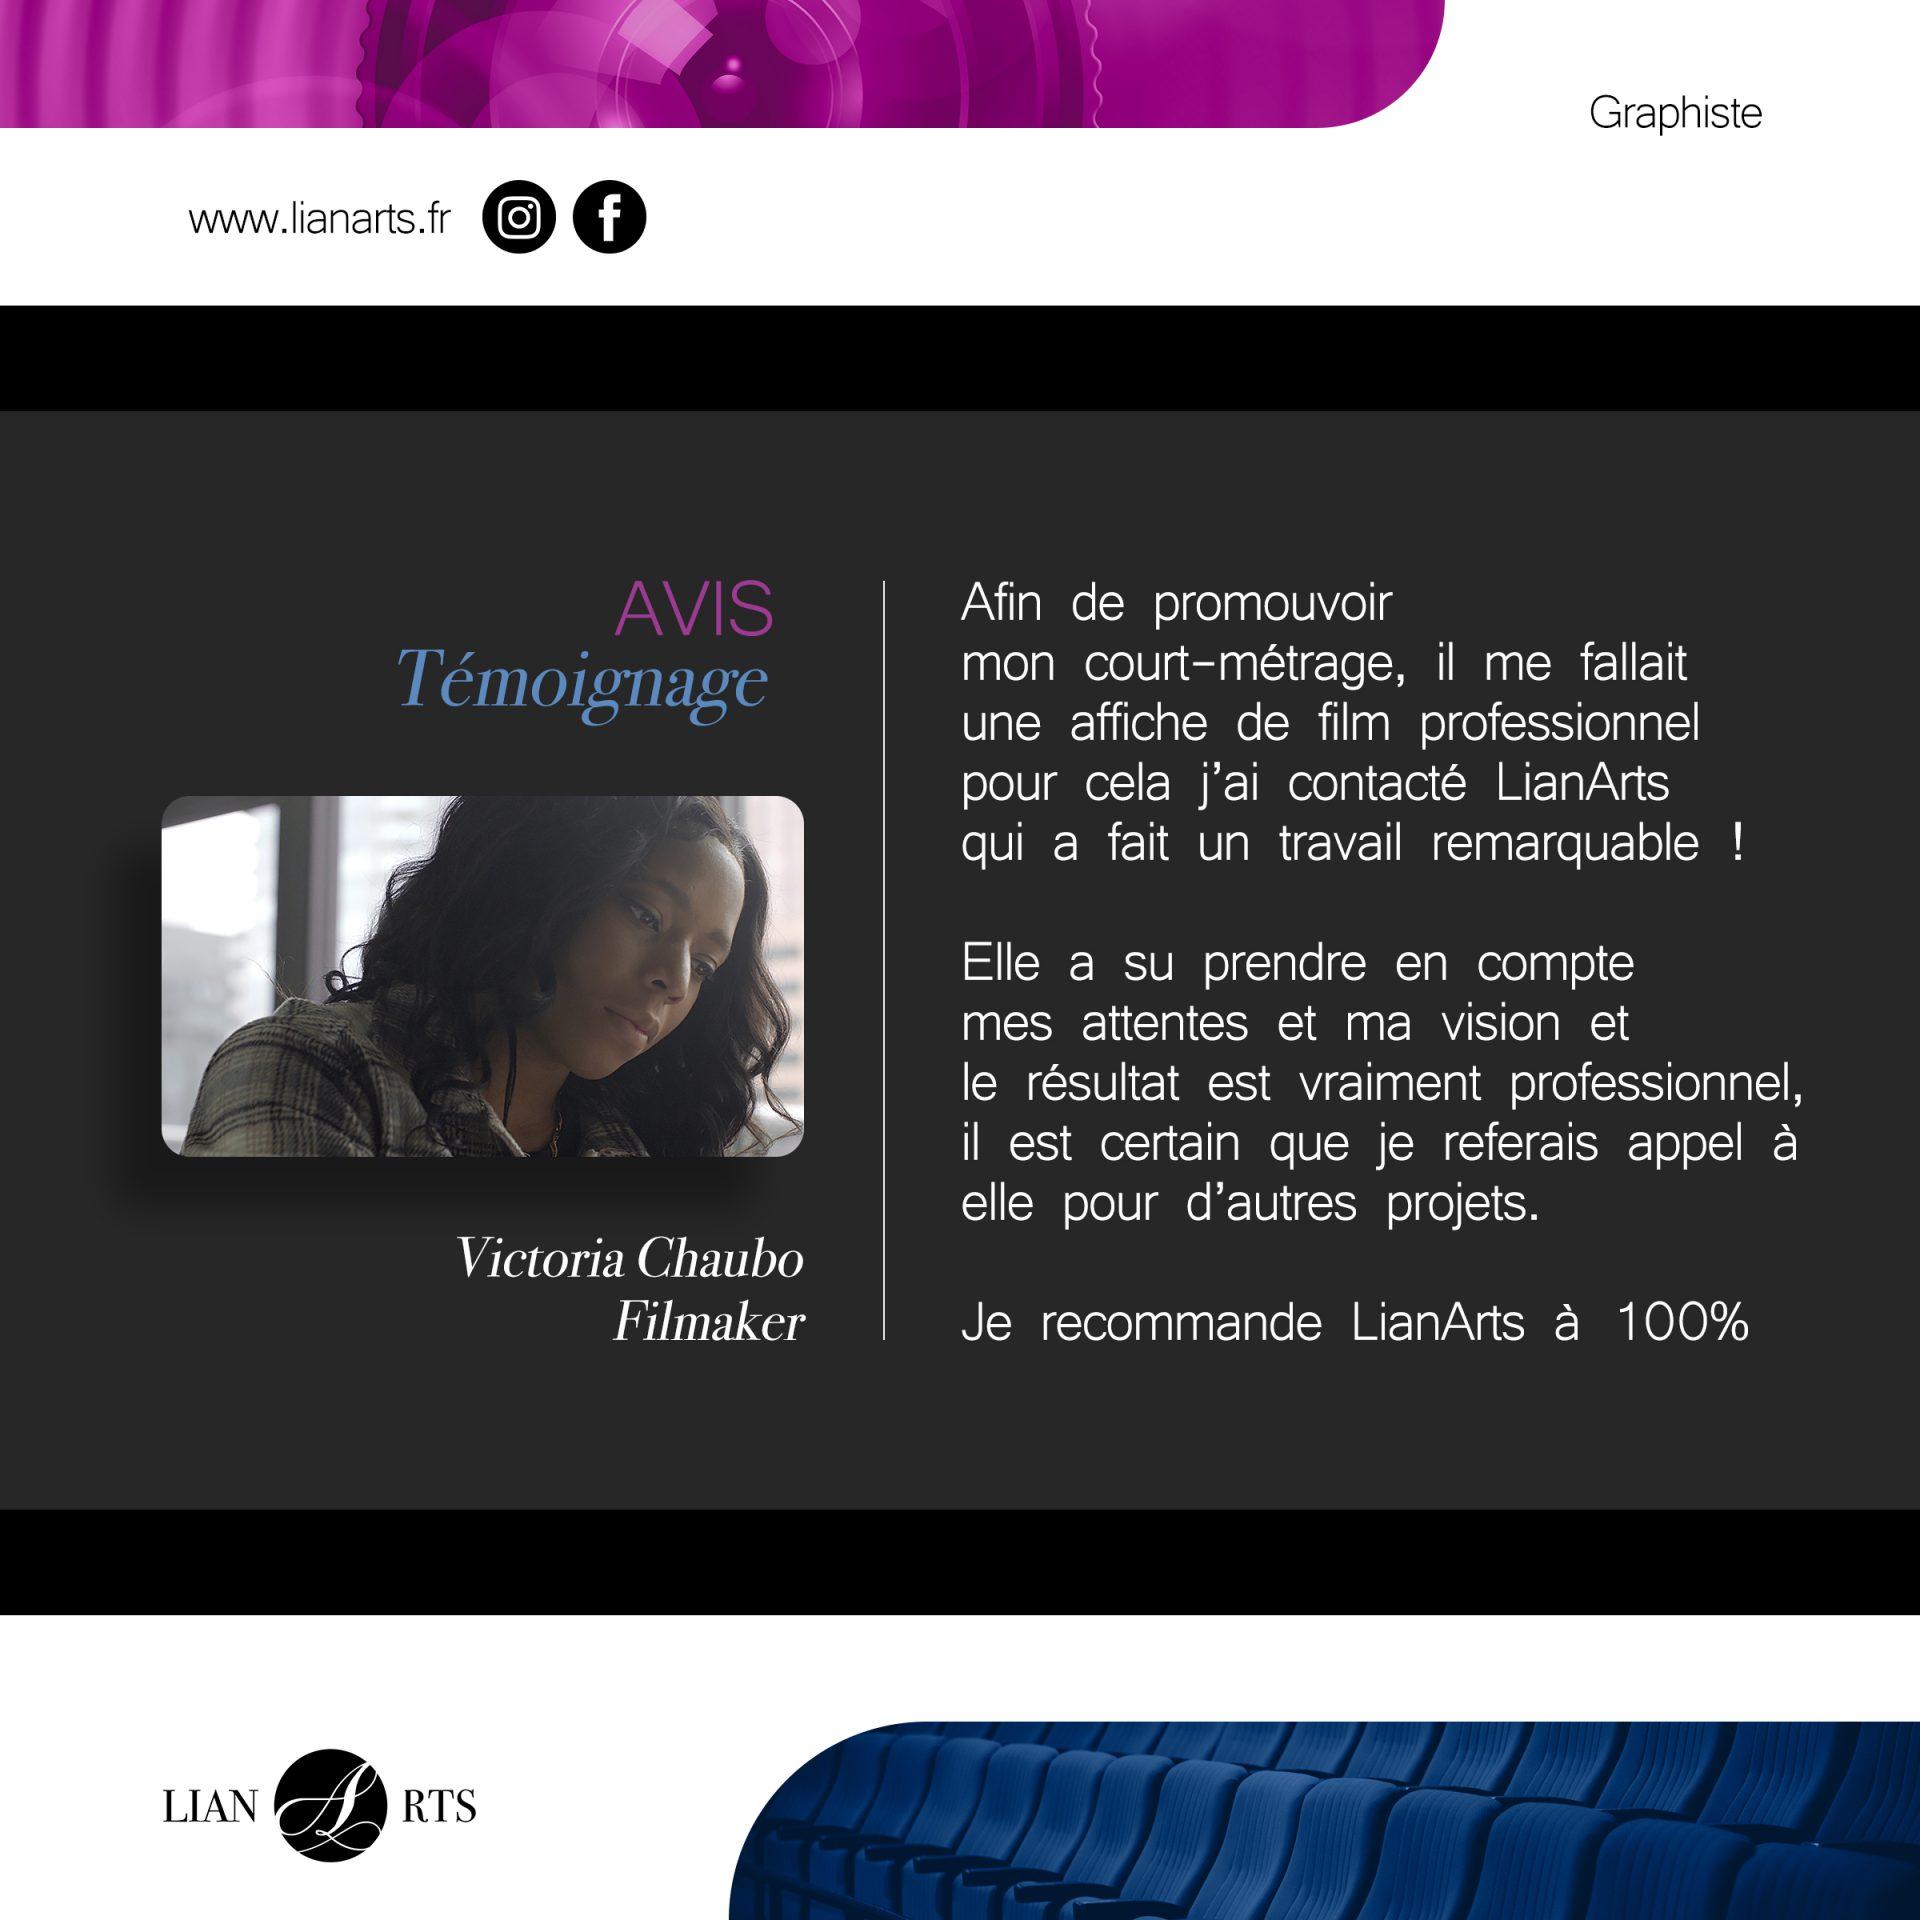 Projet - Victoria Chaubo - Création LianArts